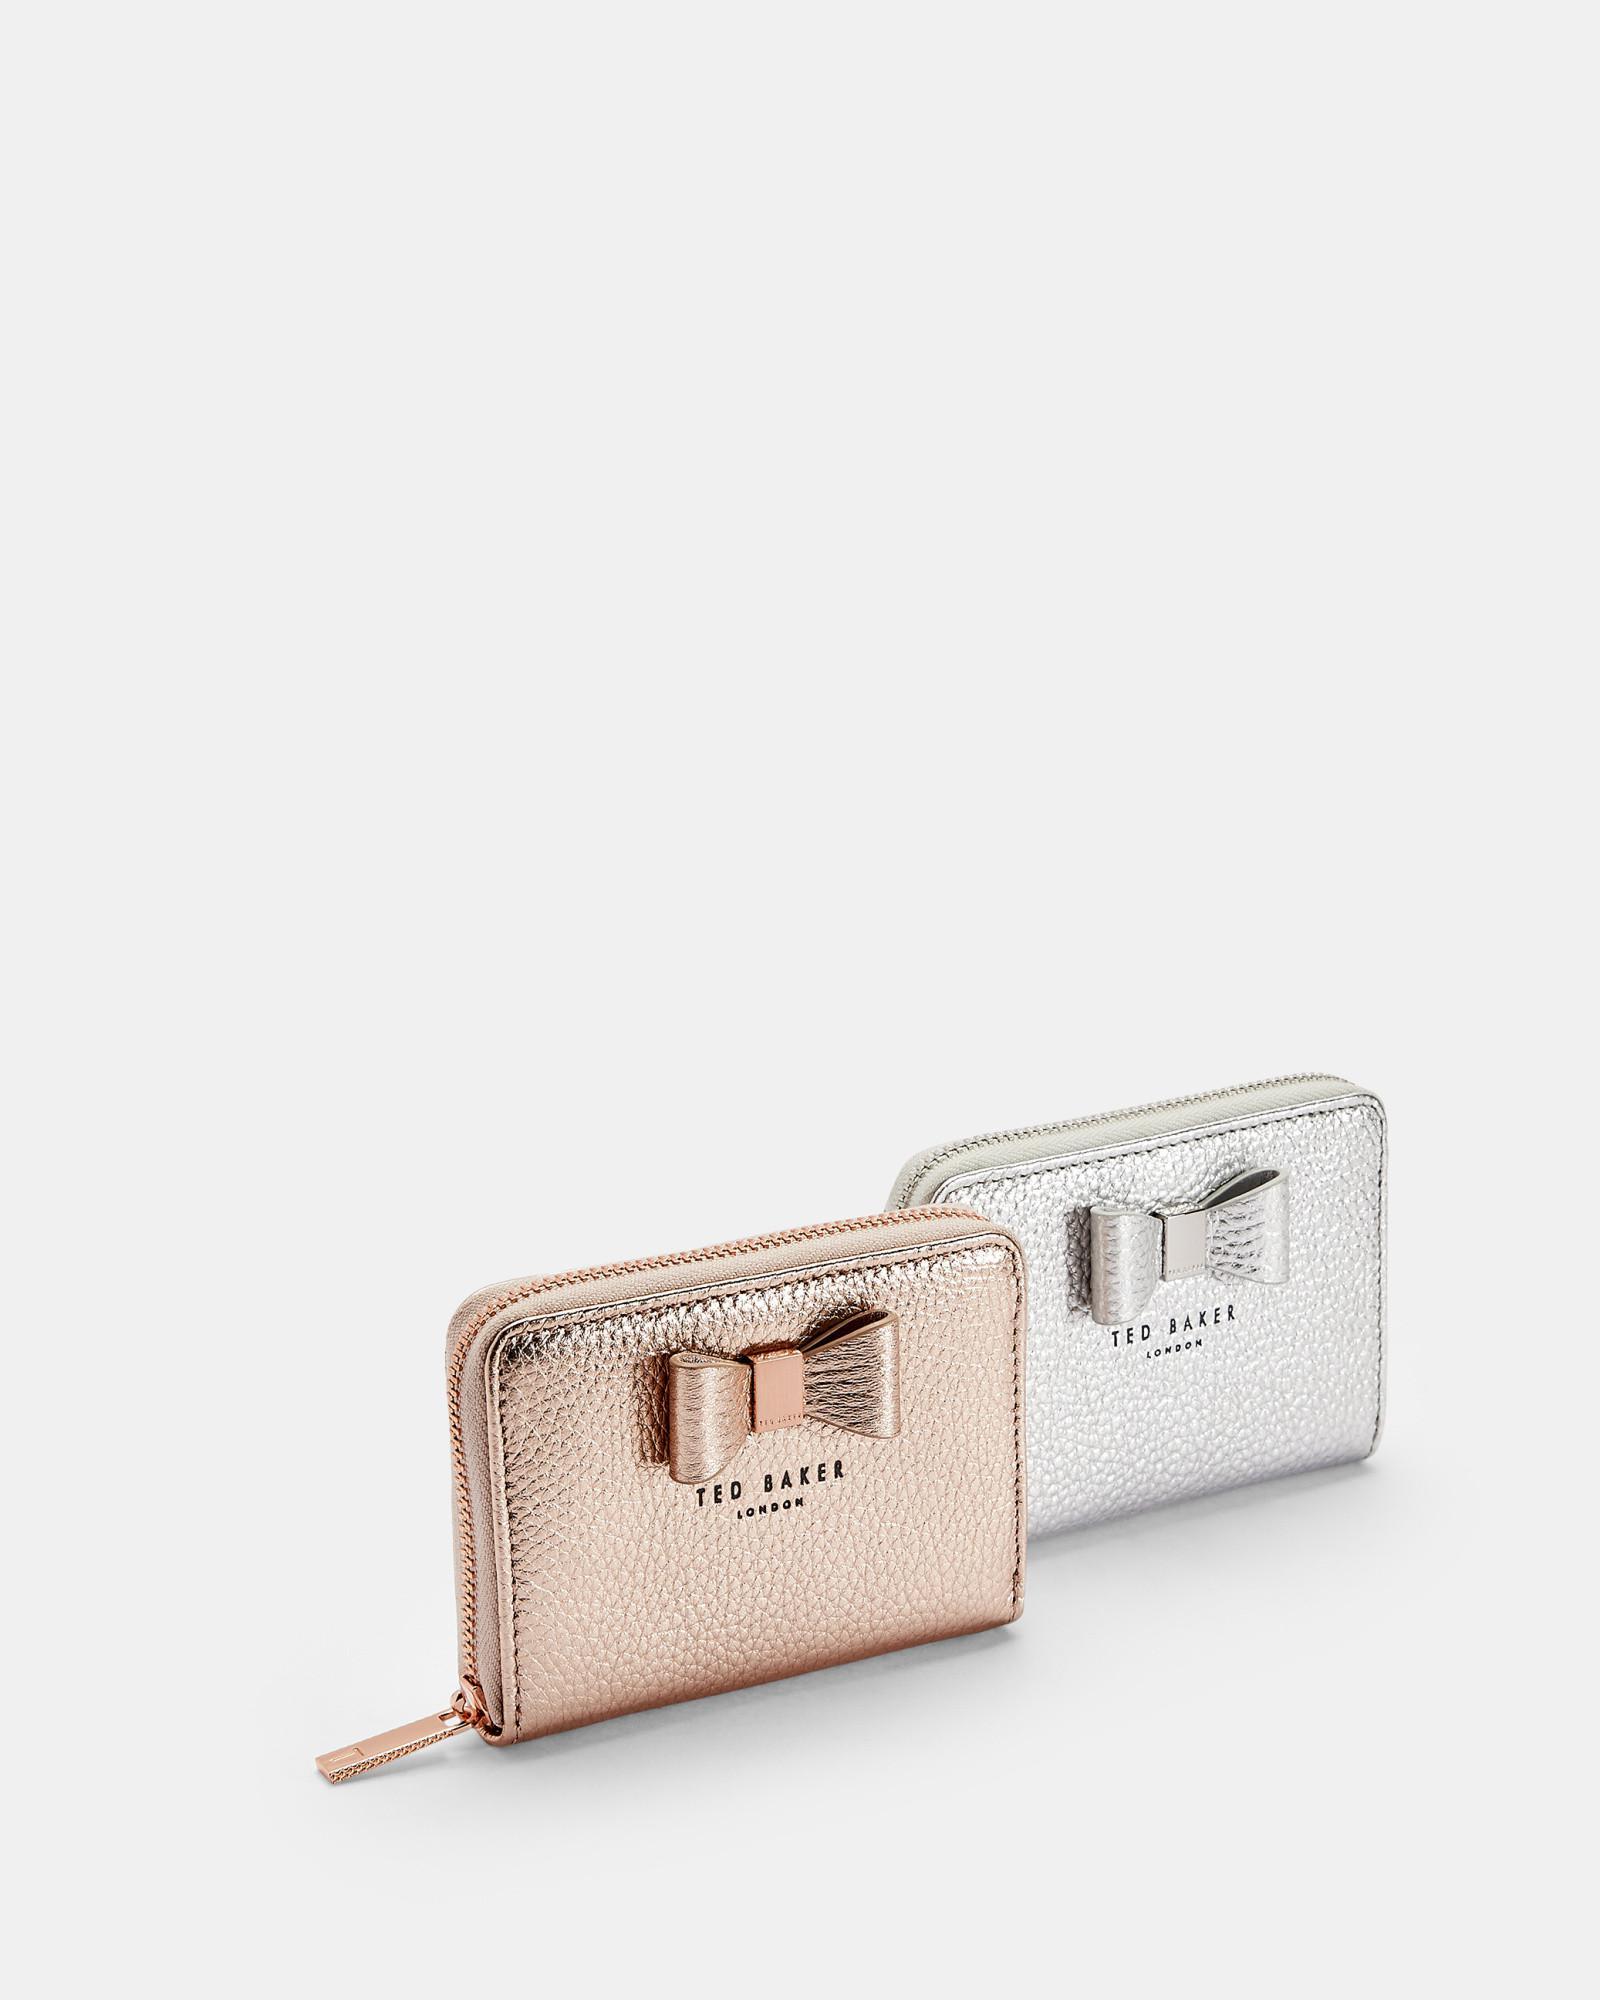 78cdb3b3178 Ted Baker Metallic Bow Small Leather Purse - Lyst